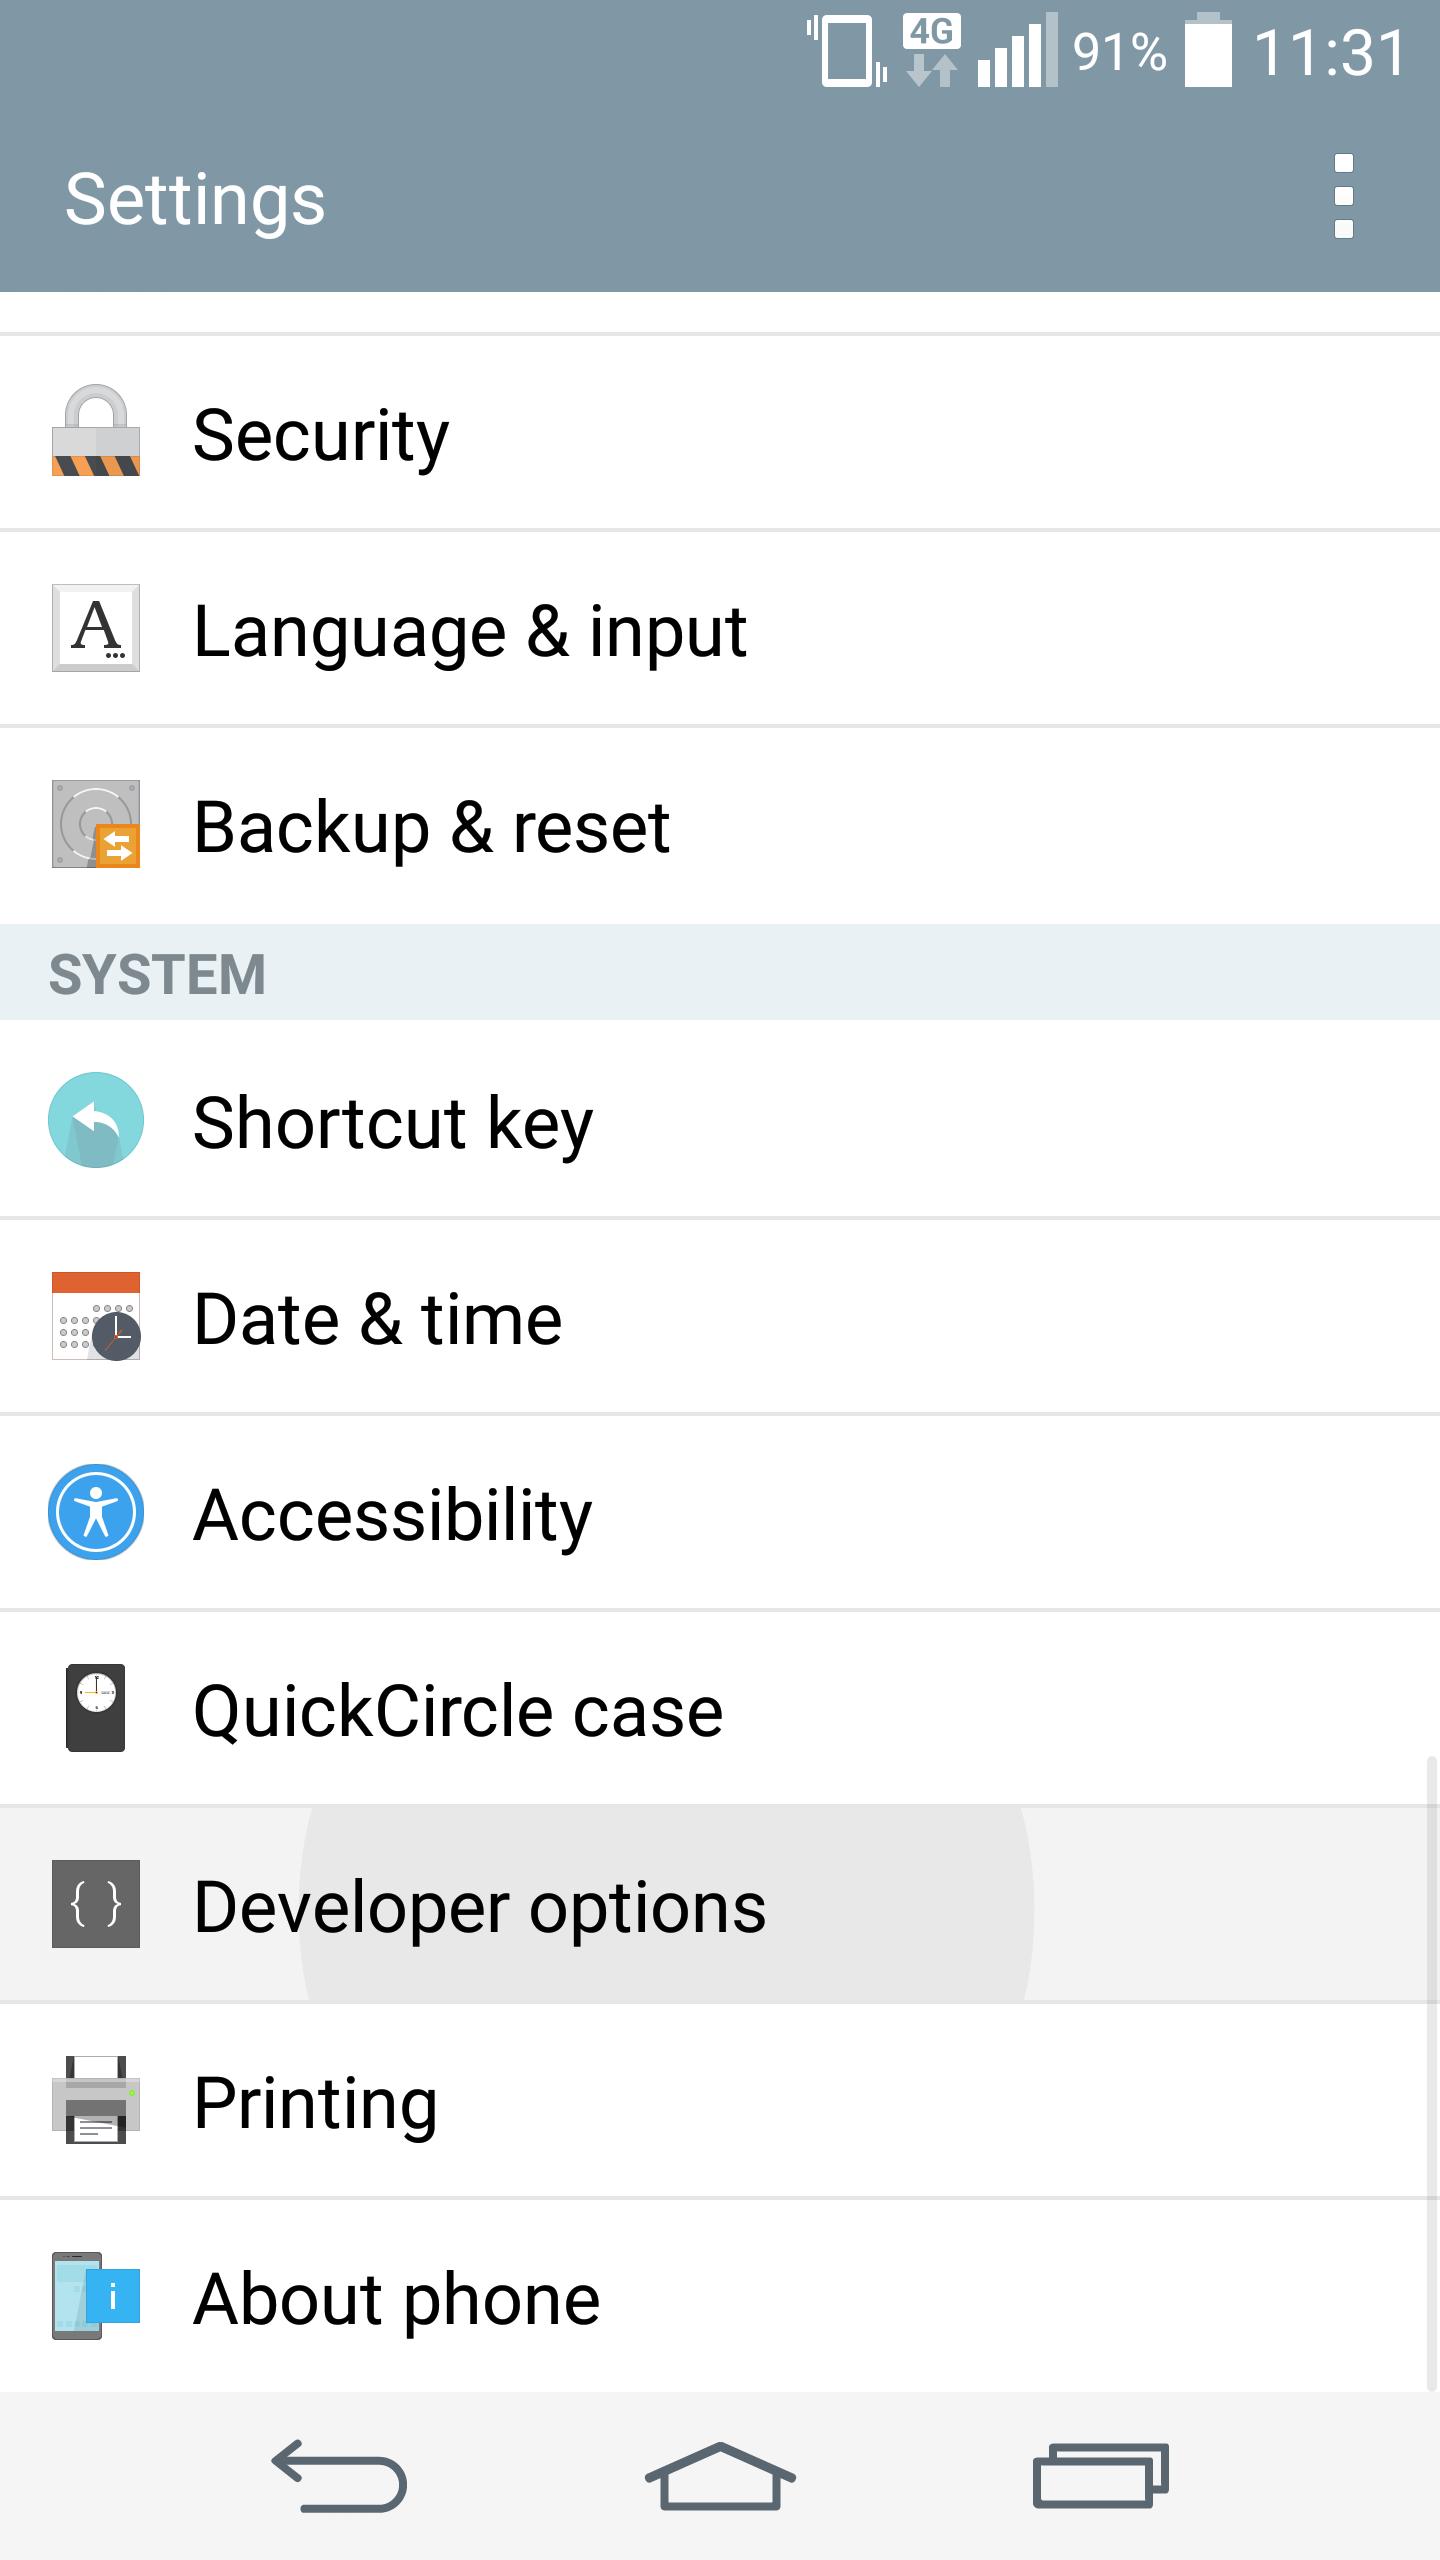 LG G3 Lollipop settings page